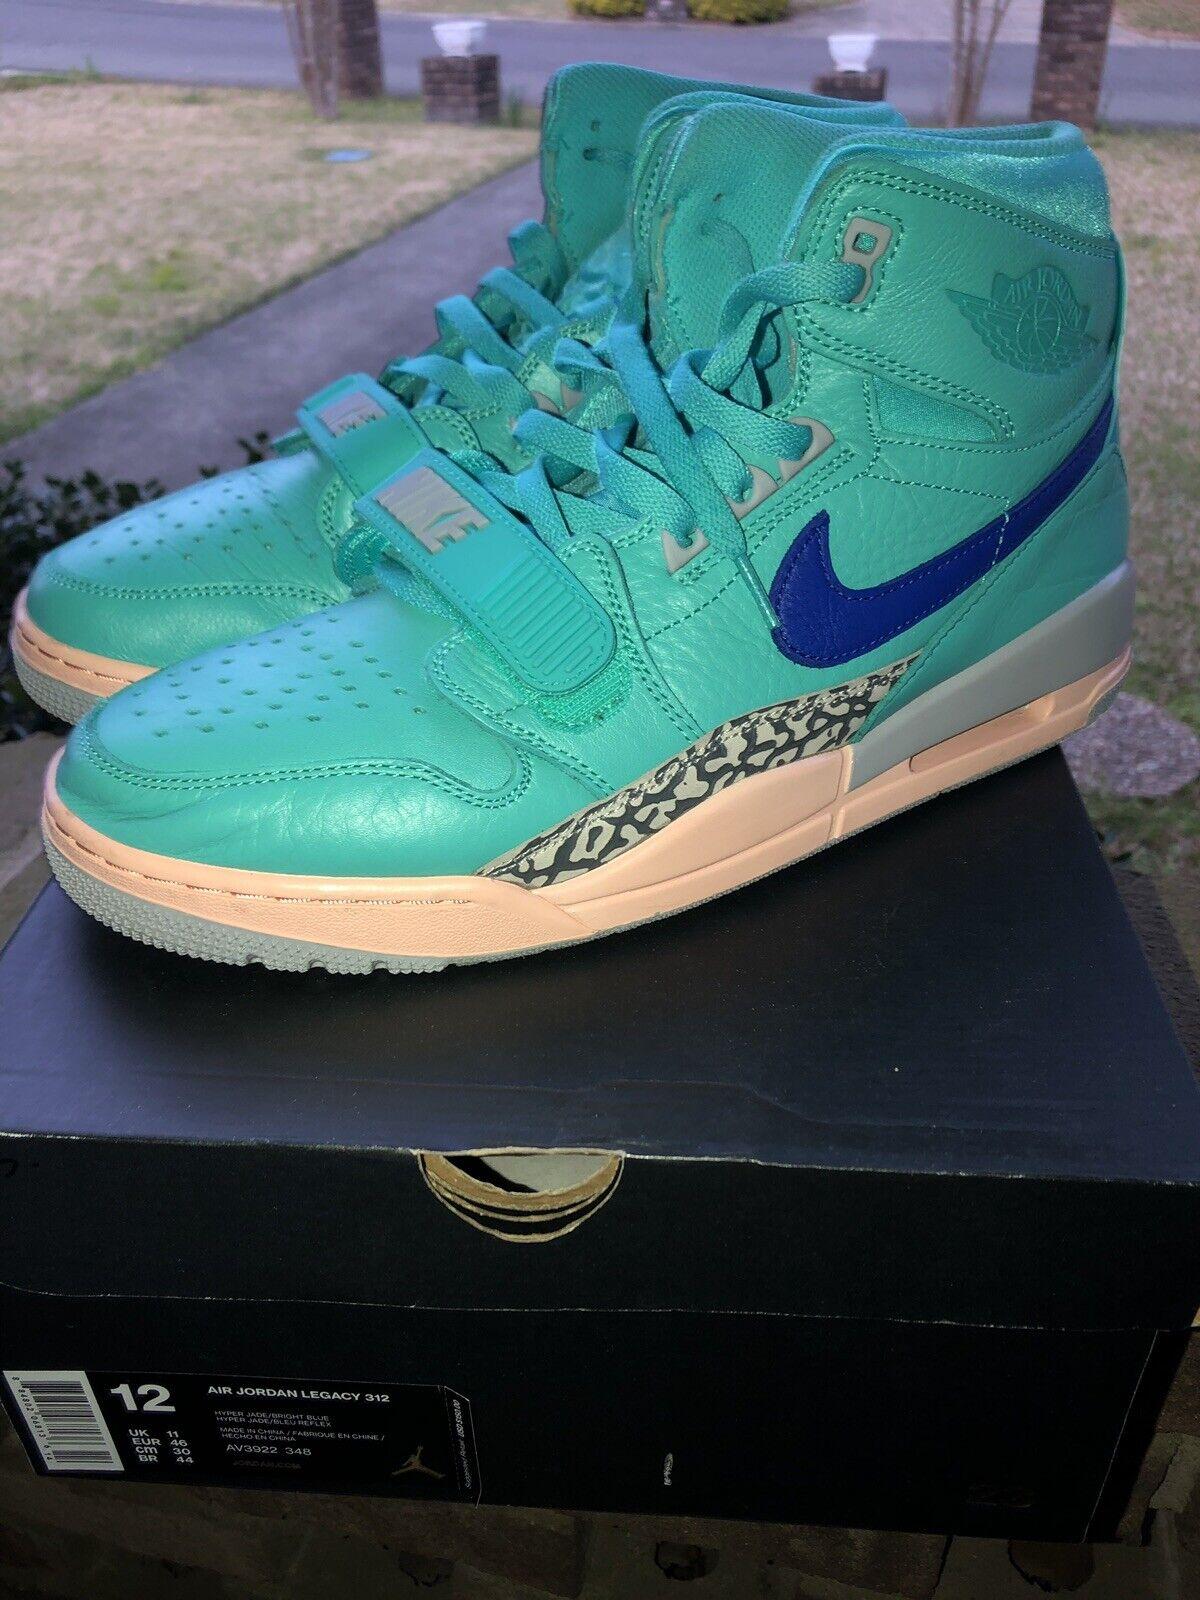 2b7b5aaade40a7 Nike Nike Nike Air Jordan Legacy 312 size 12 Hyper Jade Bright blueee 600f62